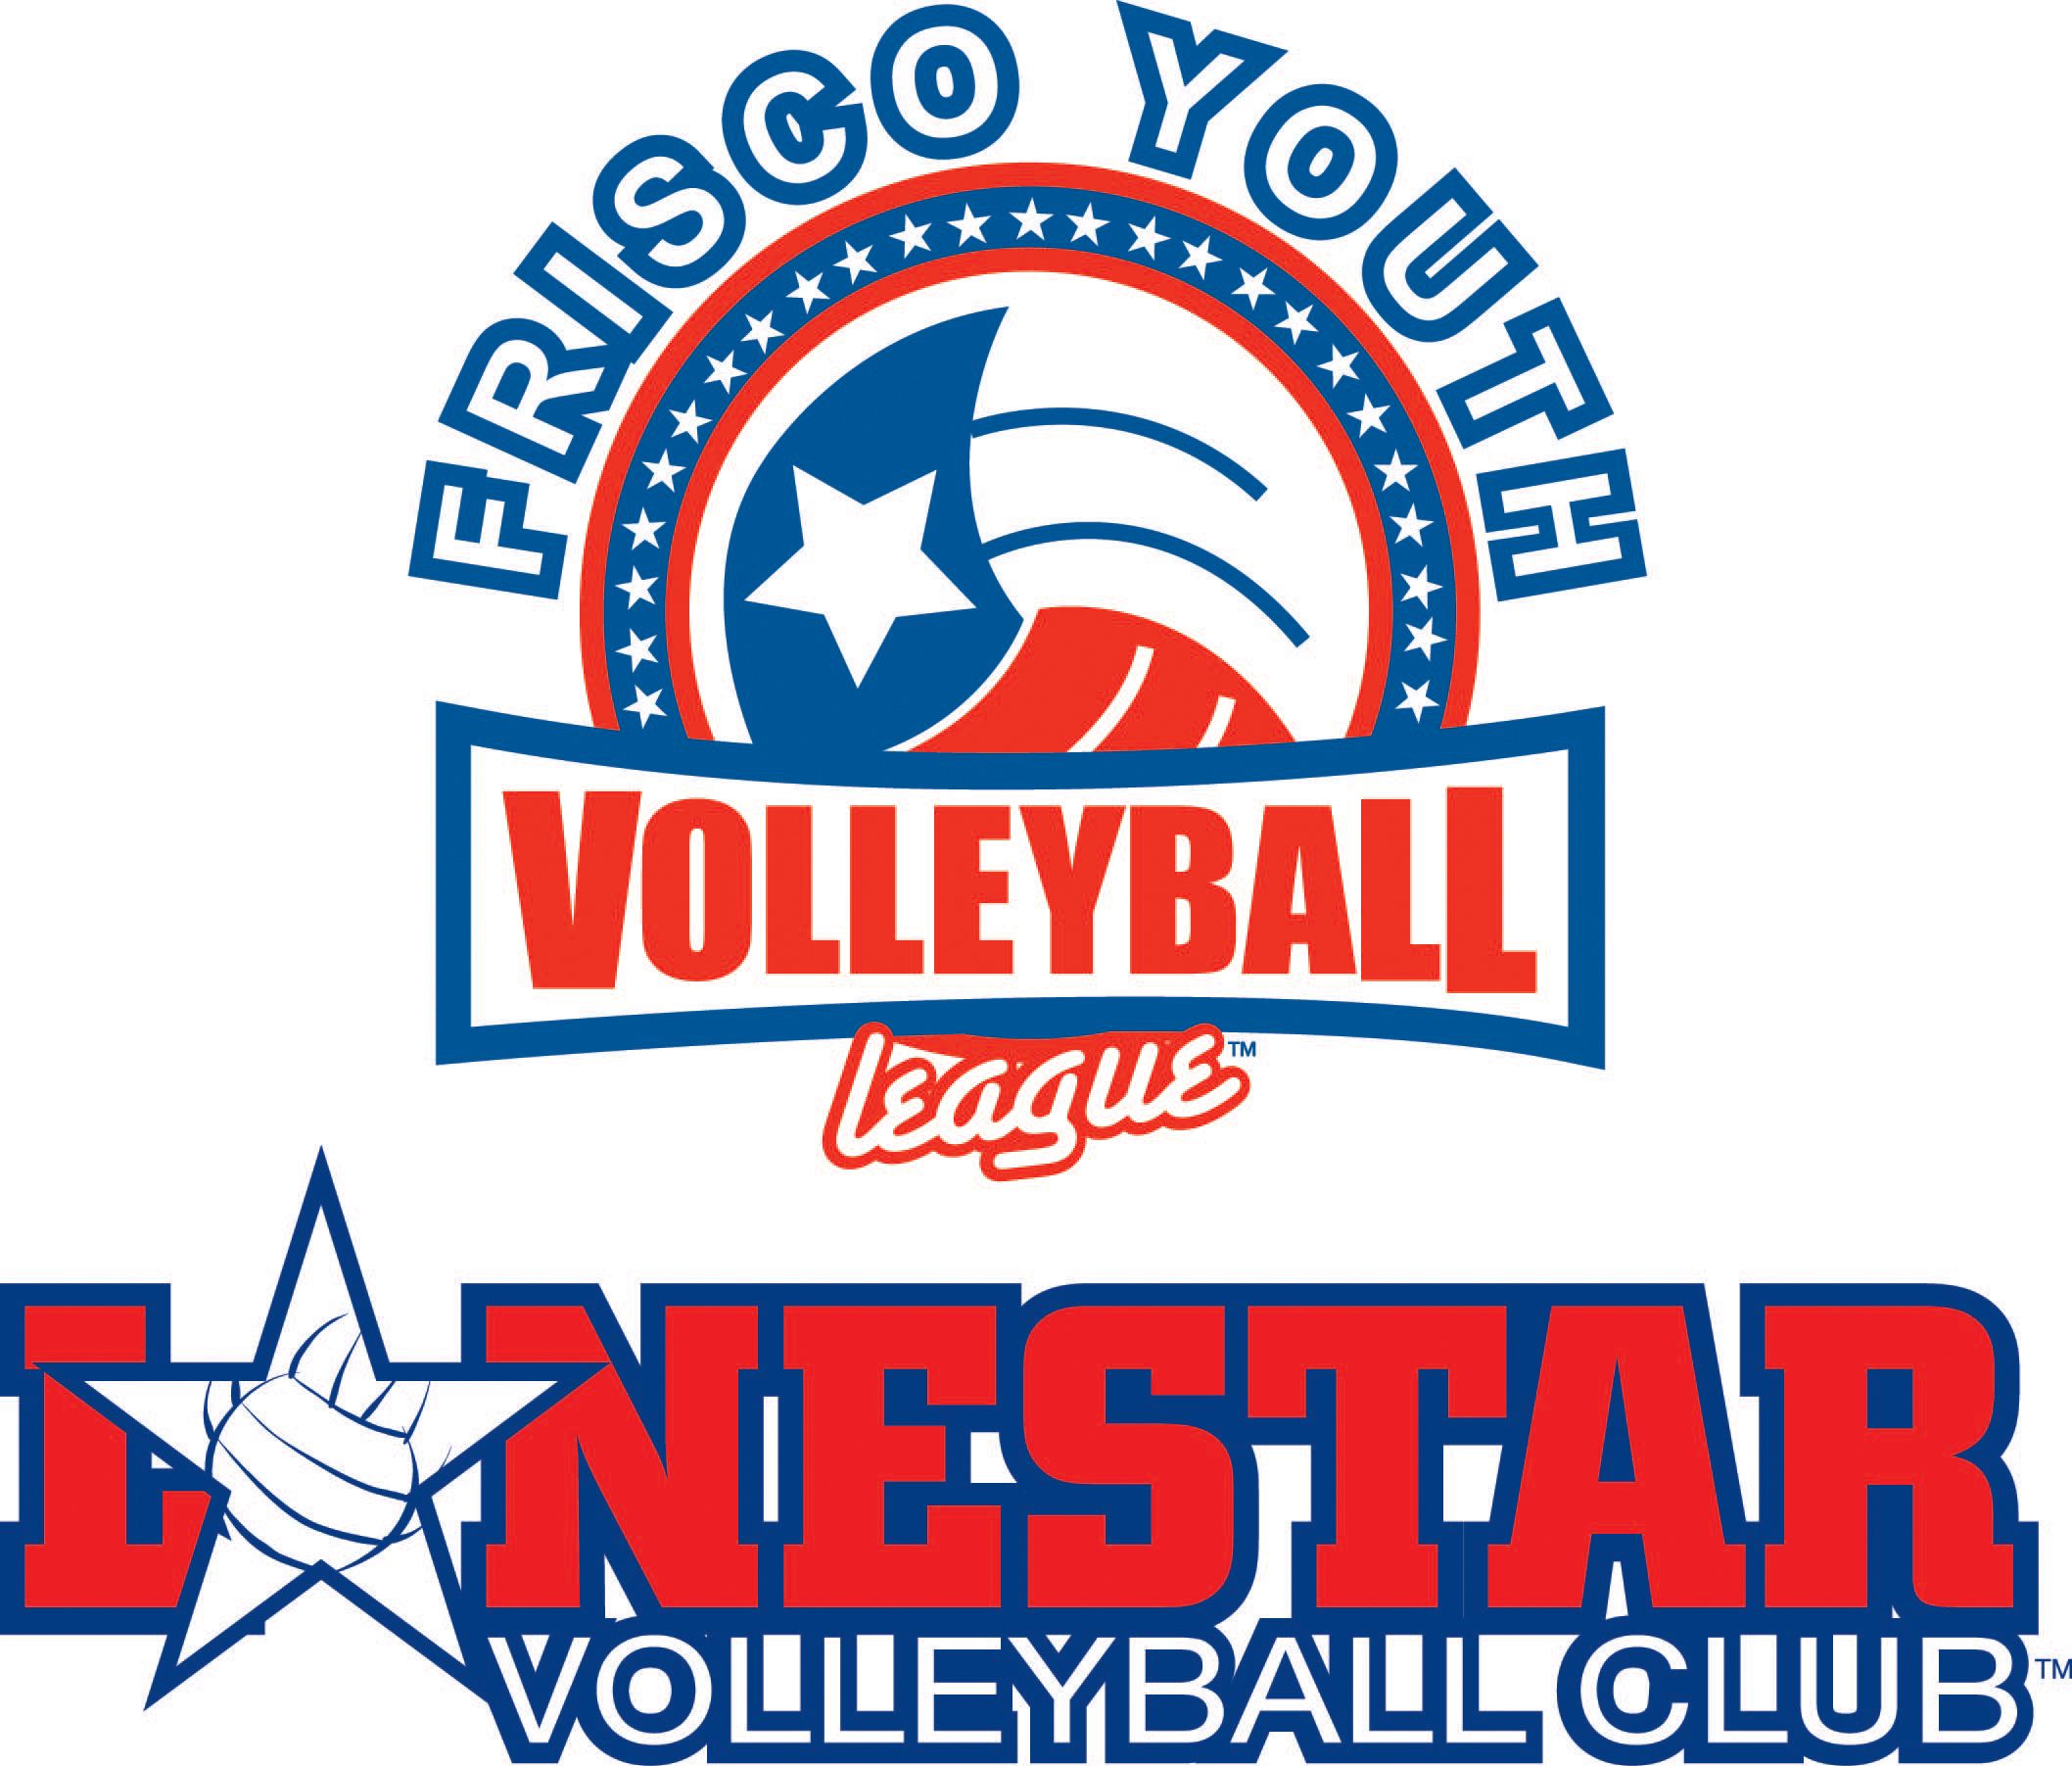 Volleyball Combined Logo Jpg 2 116 1 803 Pixels Chicago Cubs Logo Sport Team Logos Logos